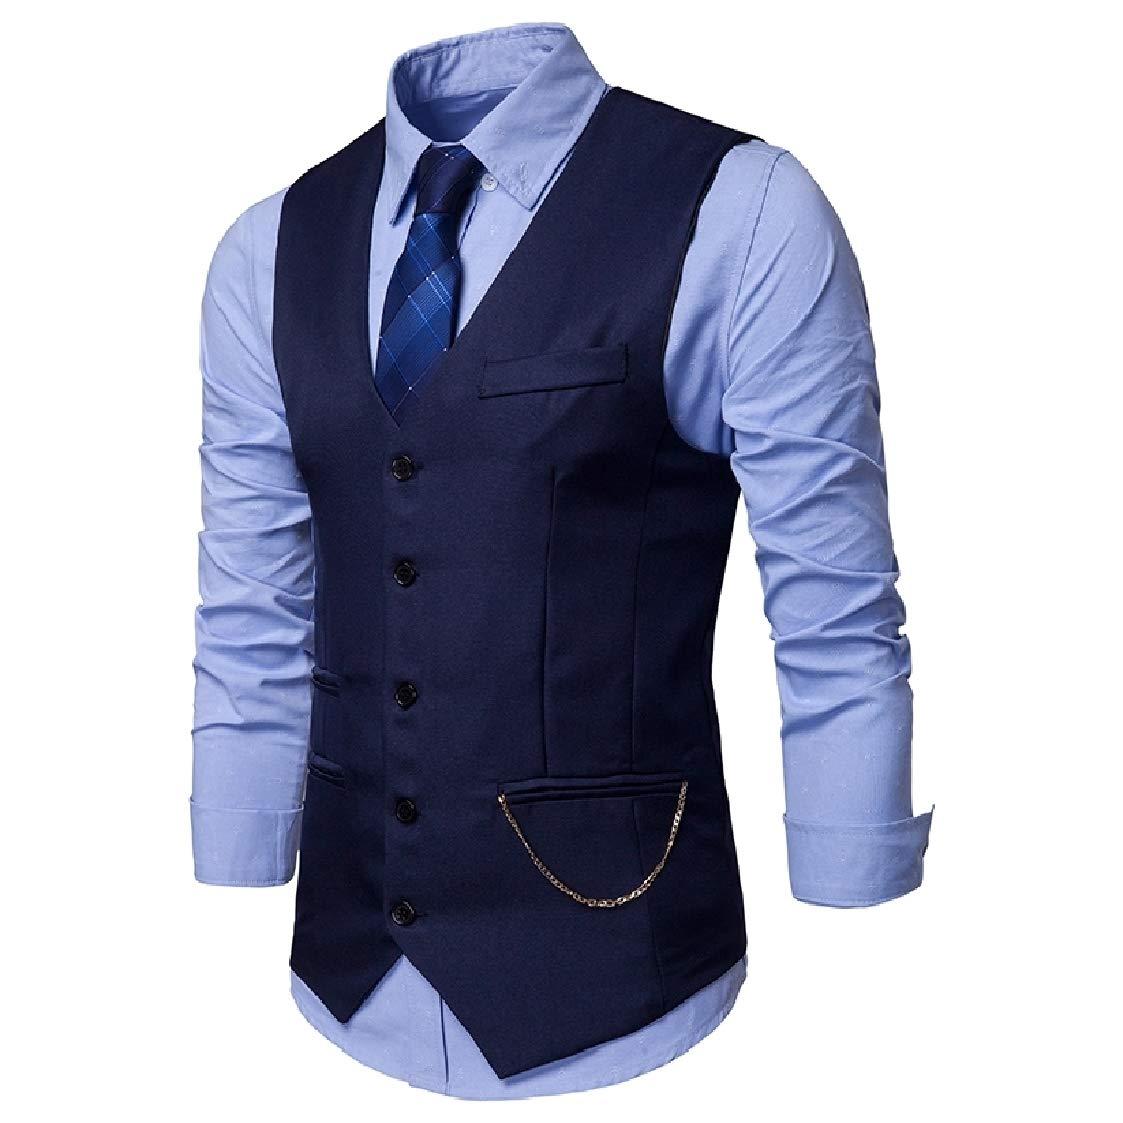 Nanquan Men Sleeveless Slim Single-Breasted V-Neck Suit Vests Waistcoat